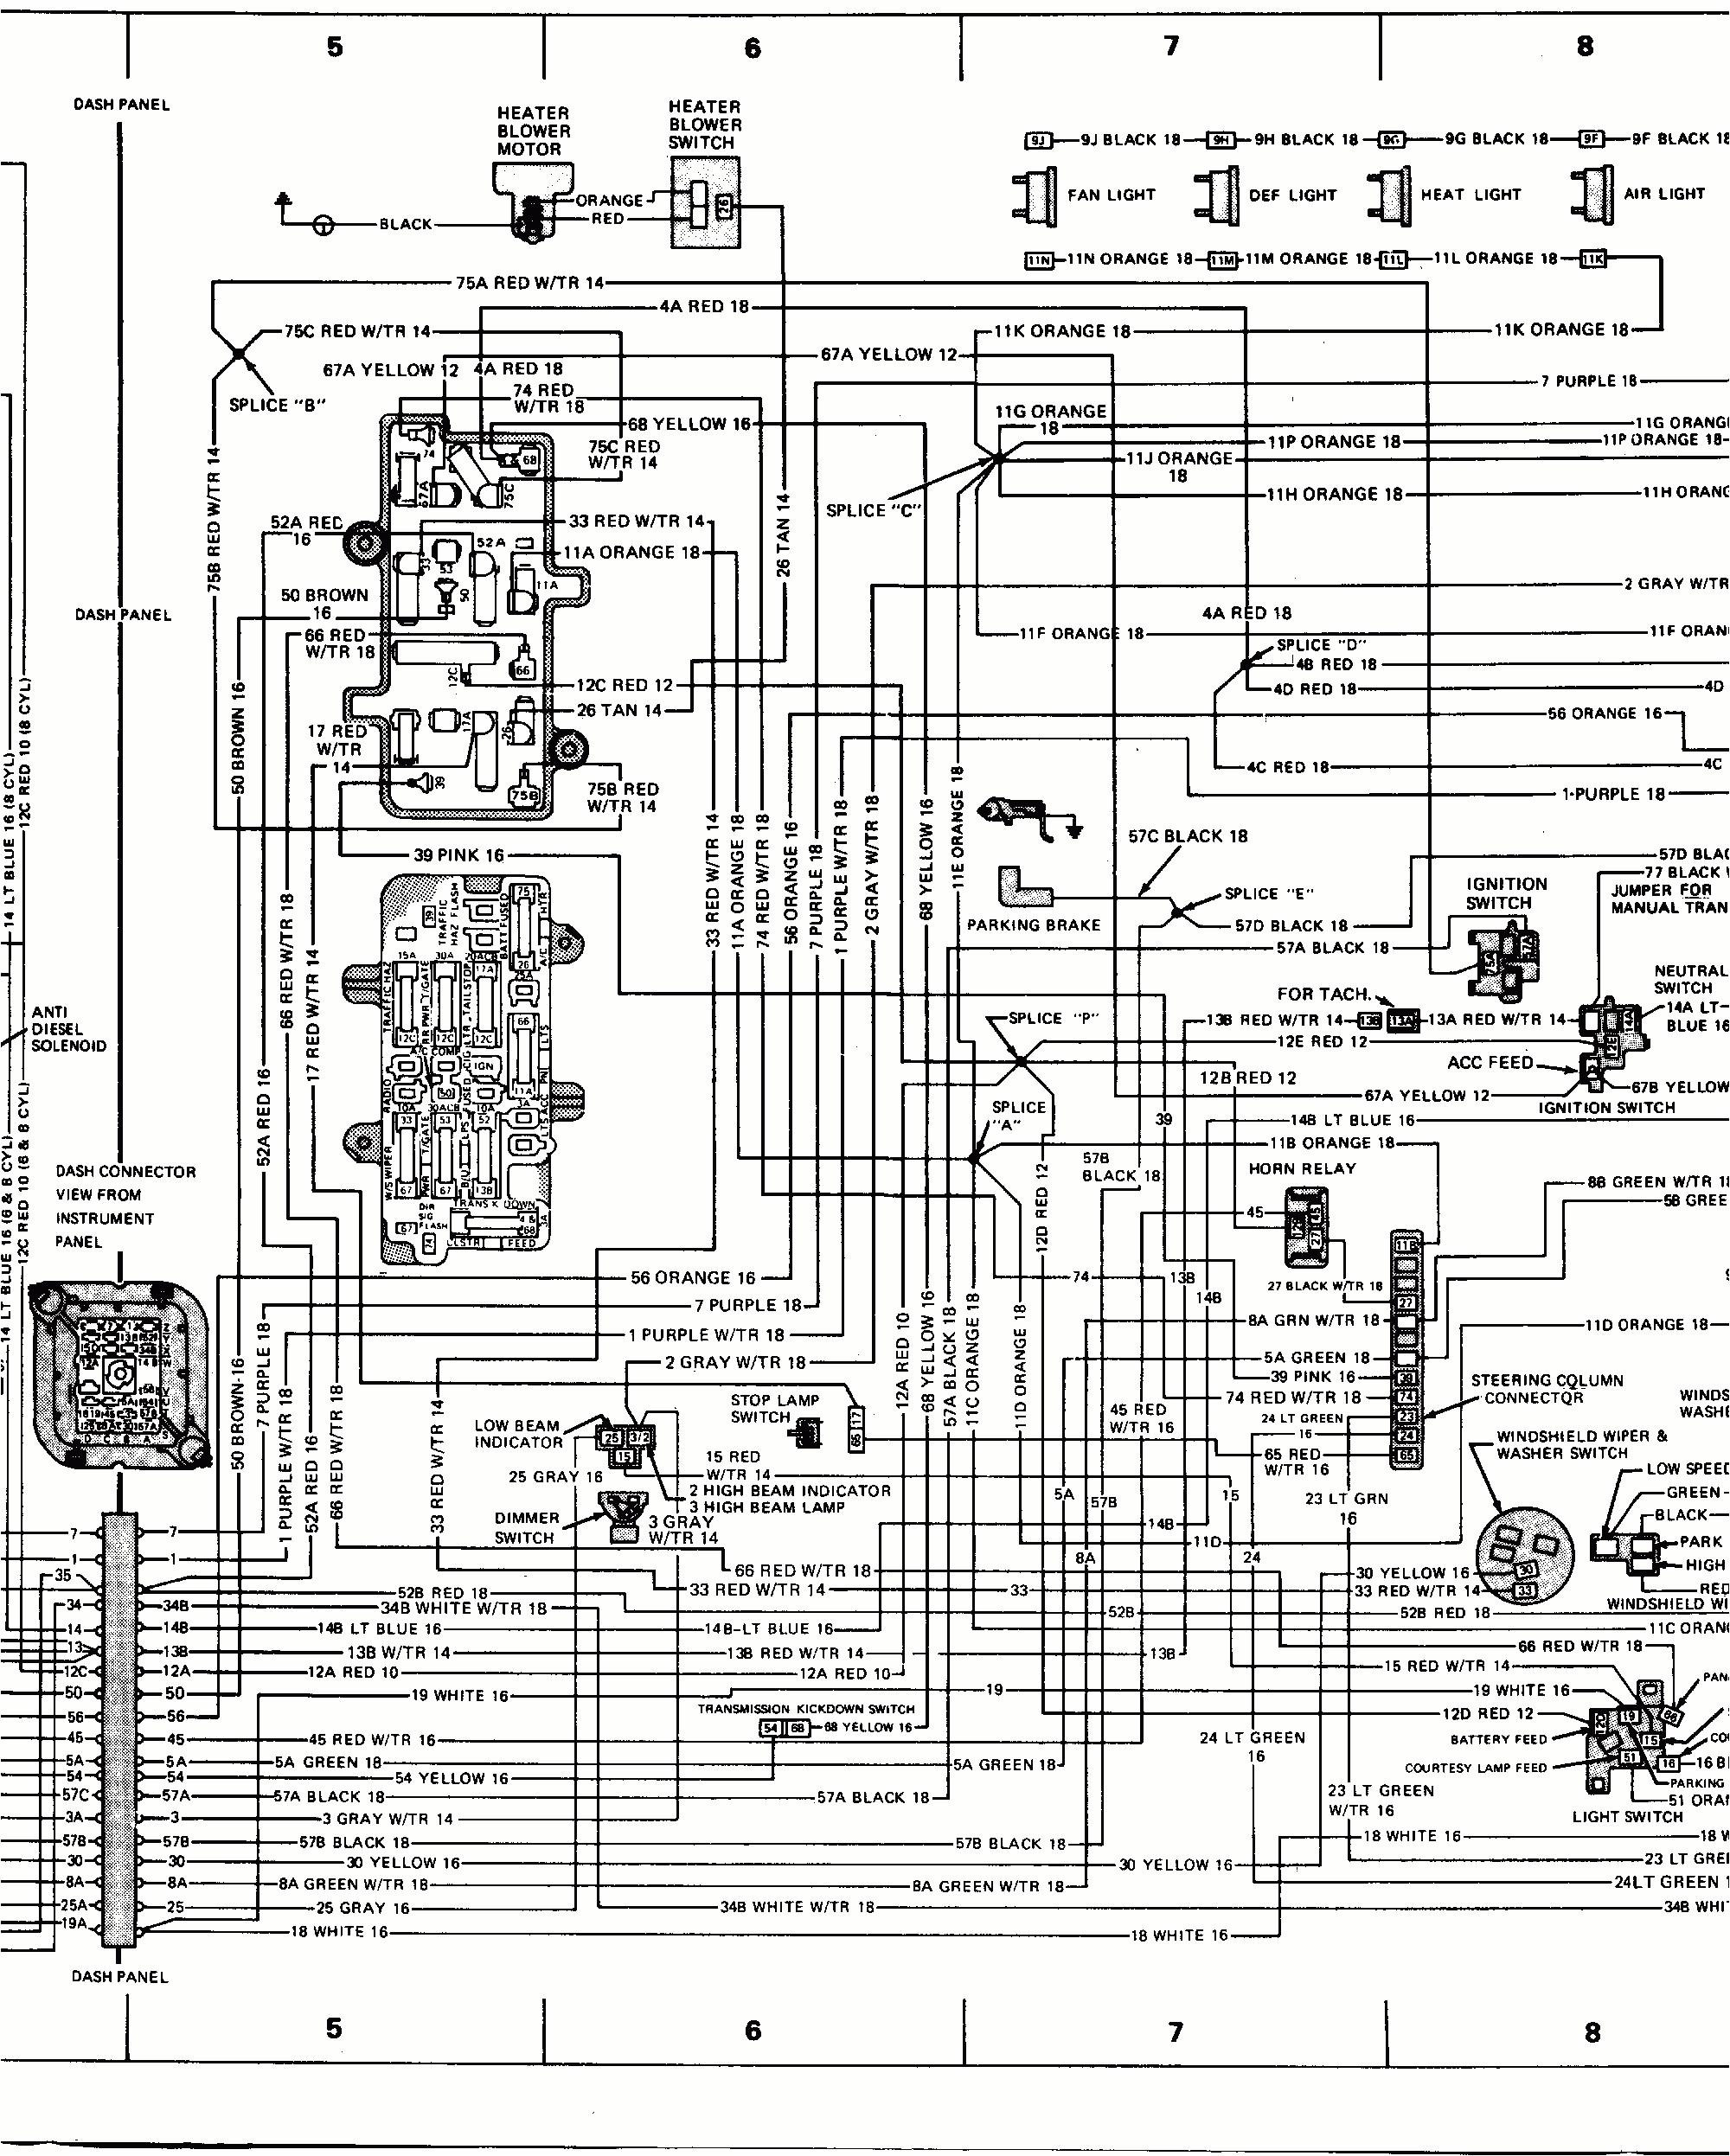 77 jeep cj7 wire harness wiring diagram paper 77 cj7 wiring diagram